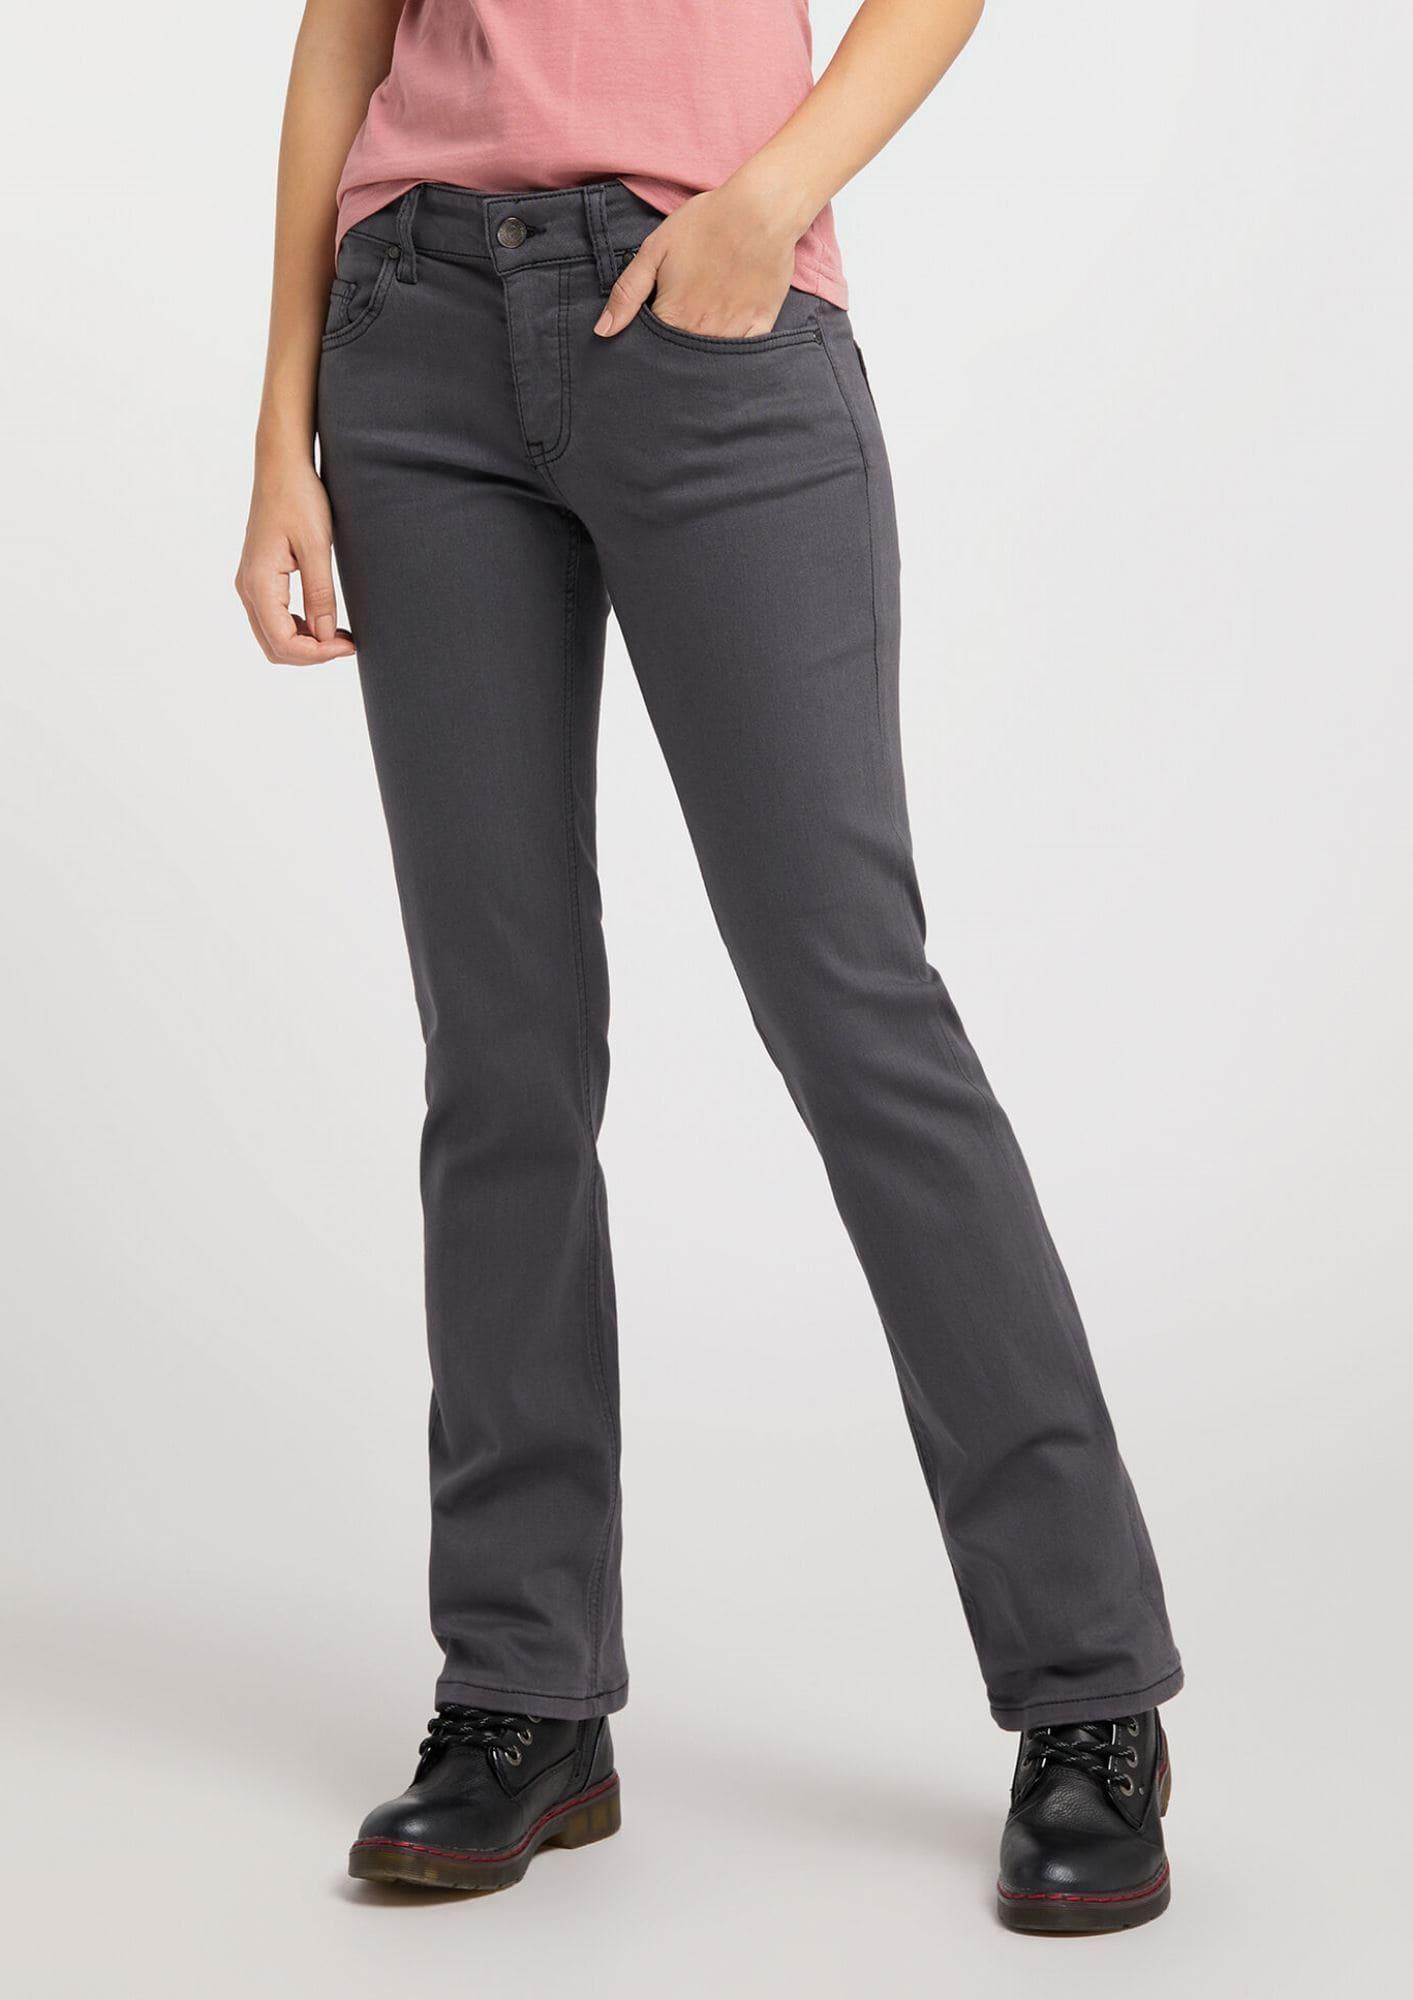 Mustang Rebecca / Julia S&P Soft & Perfect Damen Jeans / be flexible